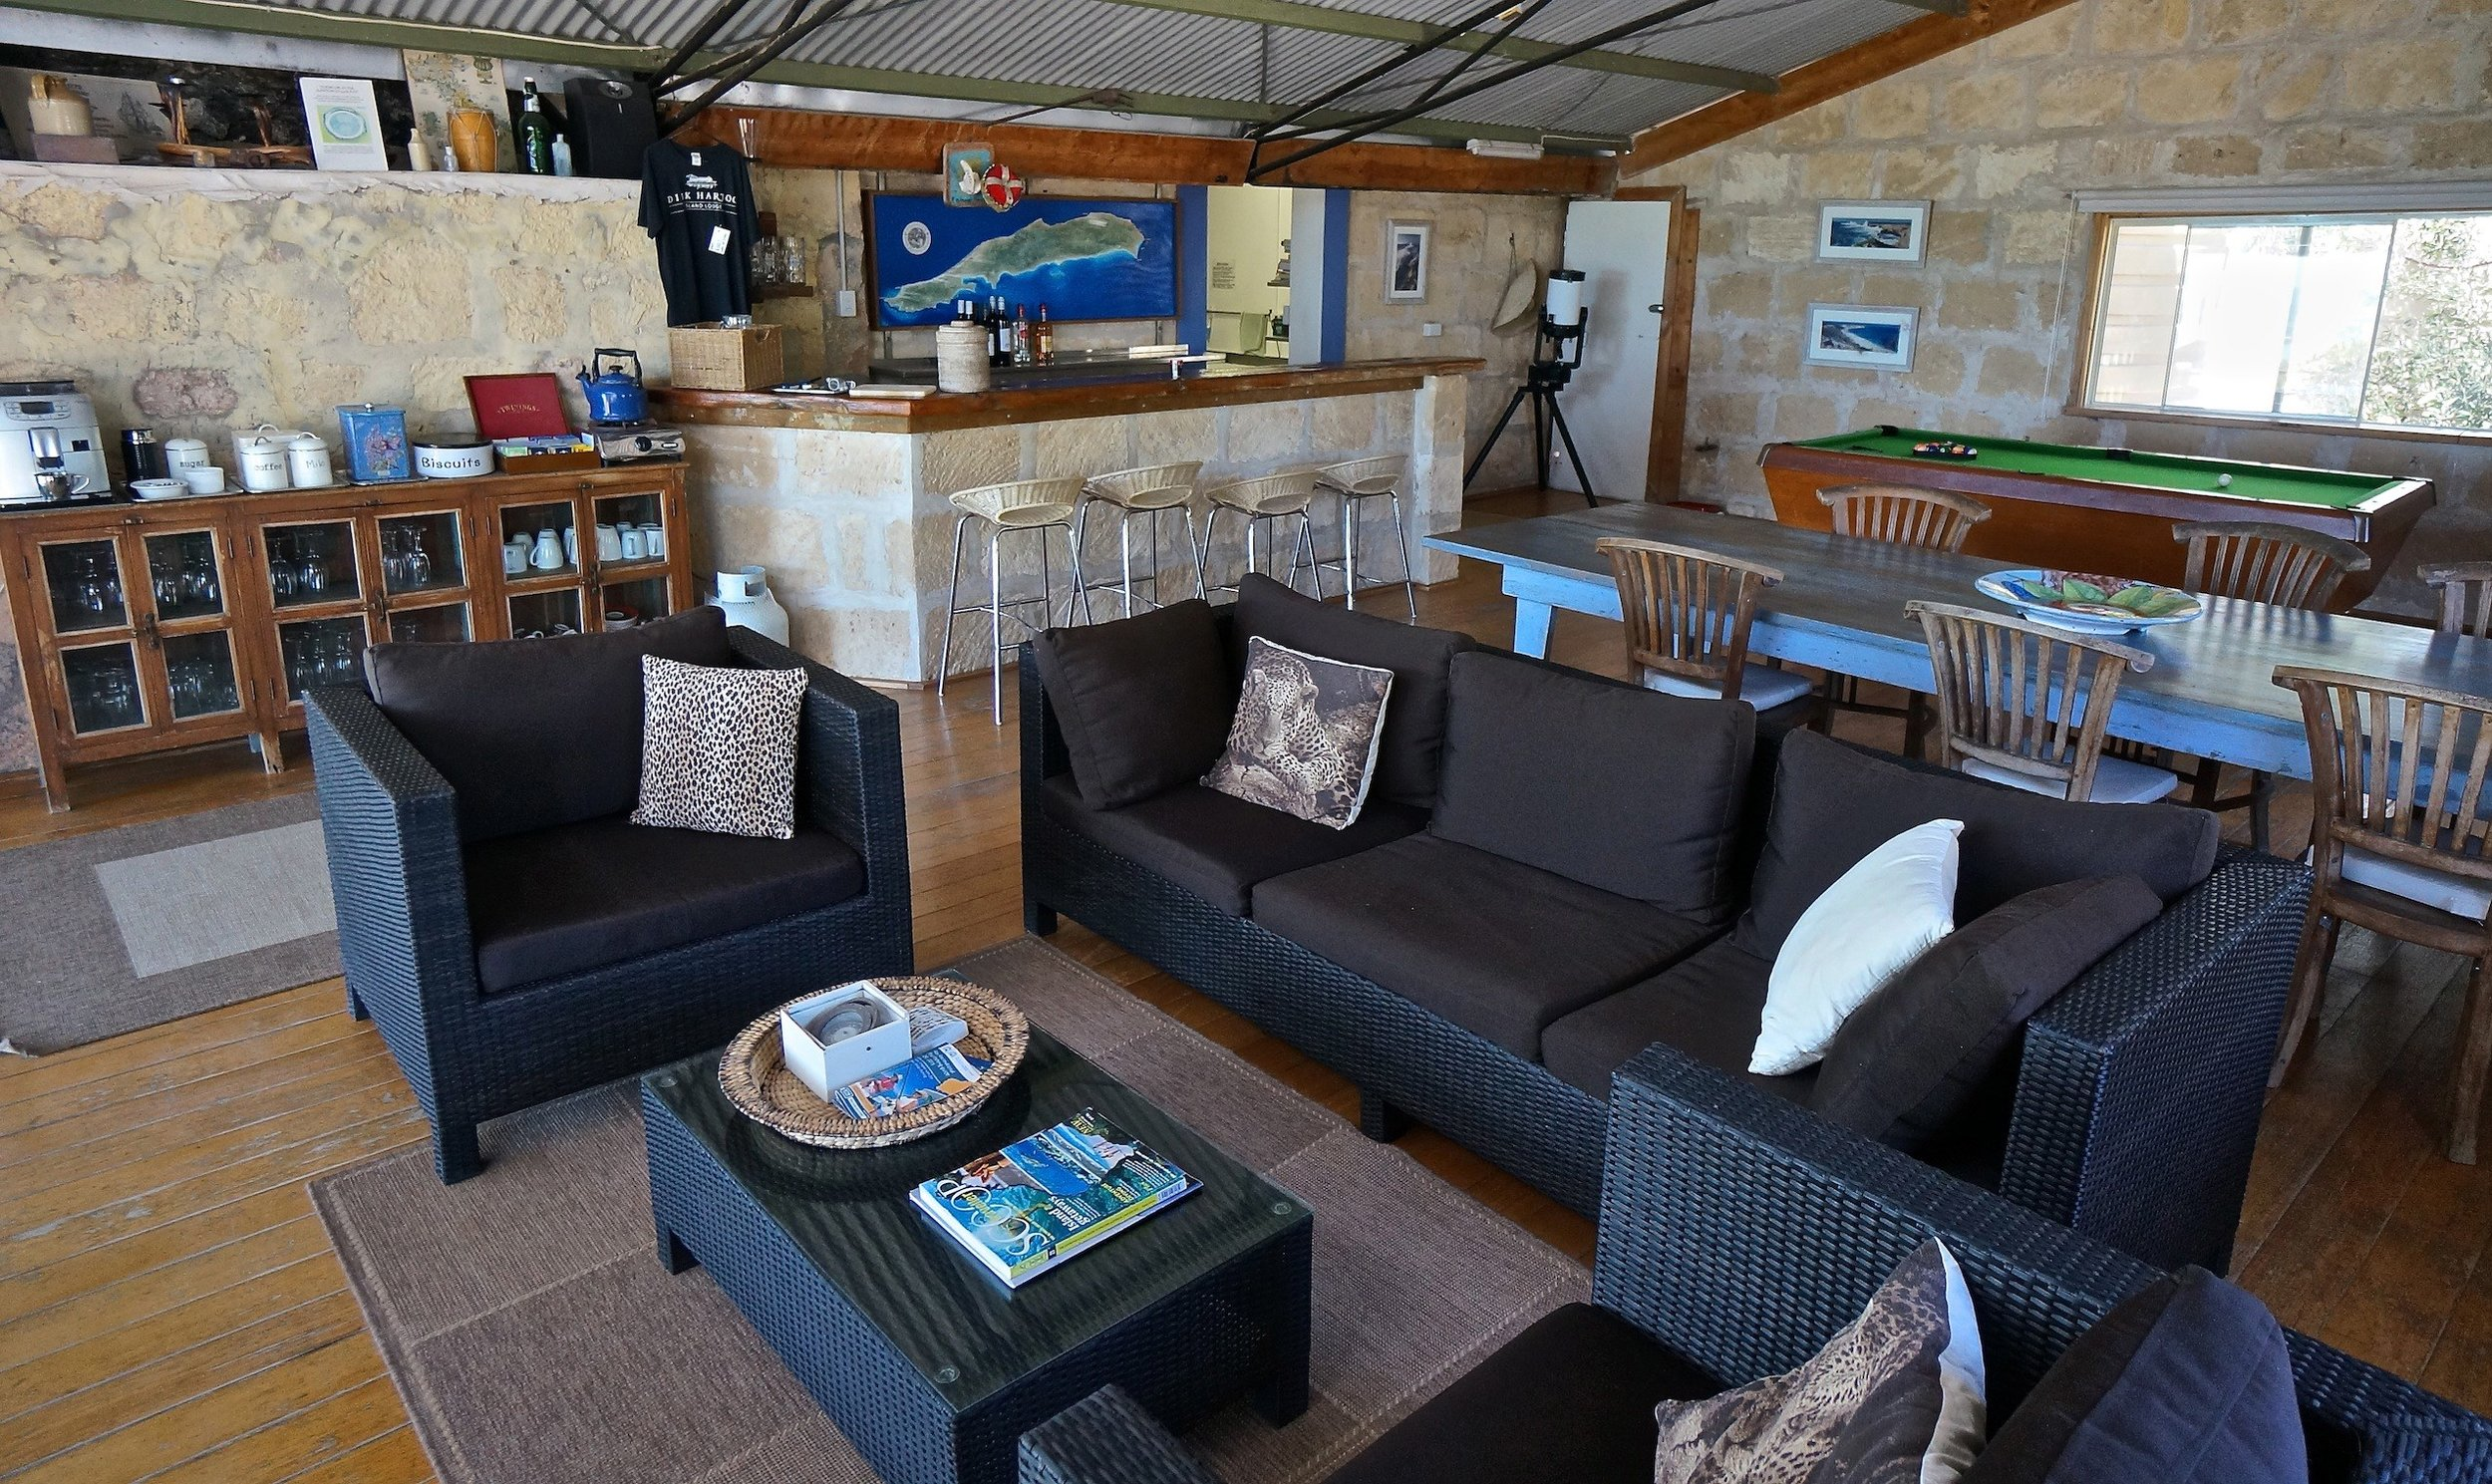 dirk-hartog-island-eco-lodge-9498360.jpg